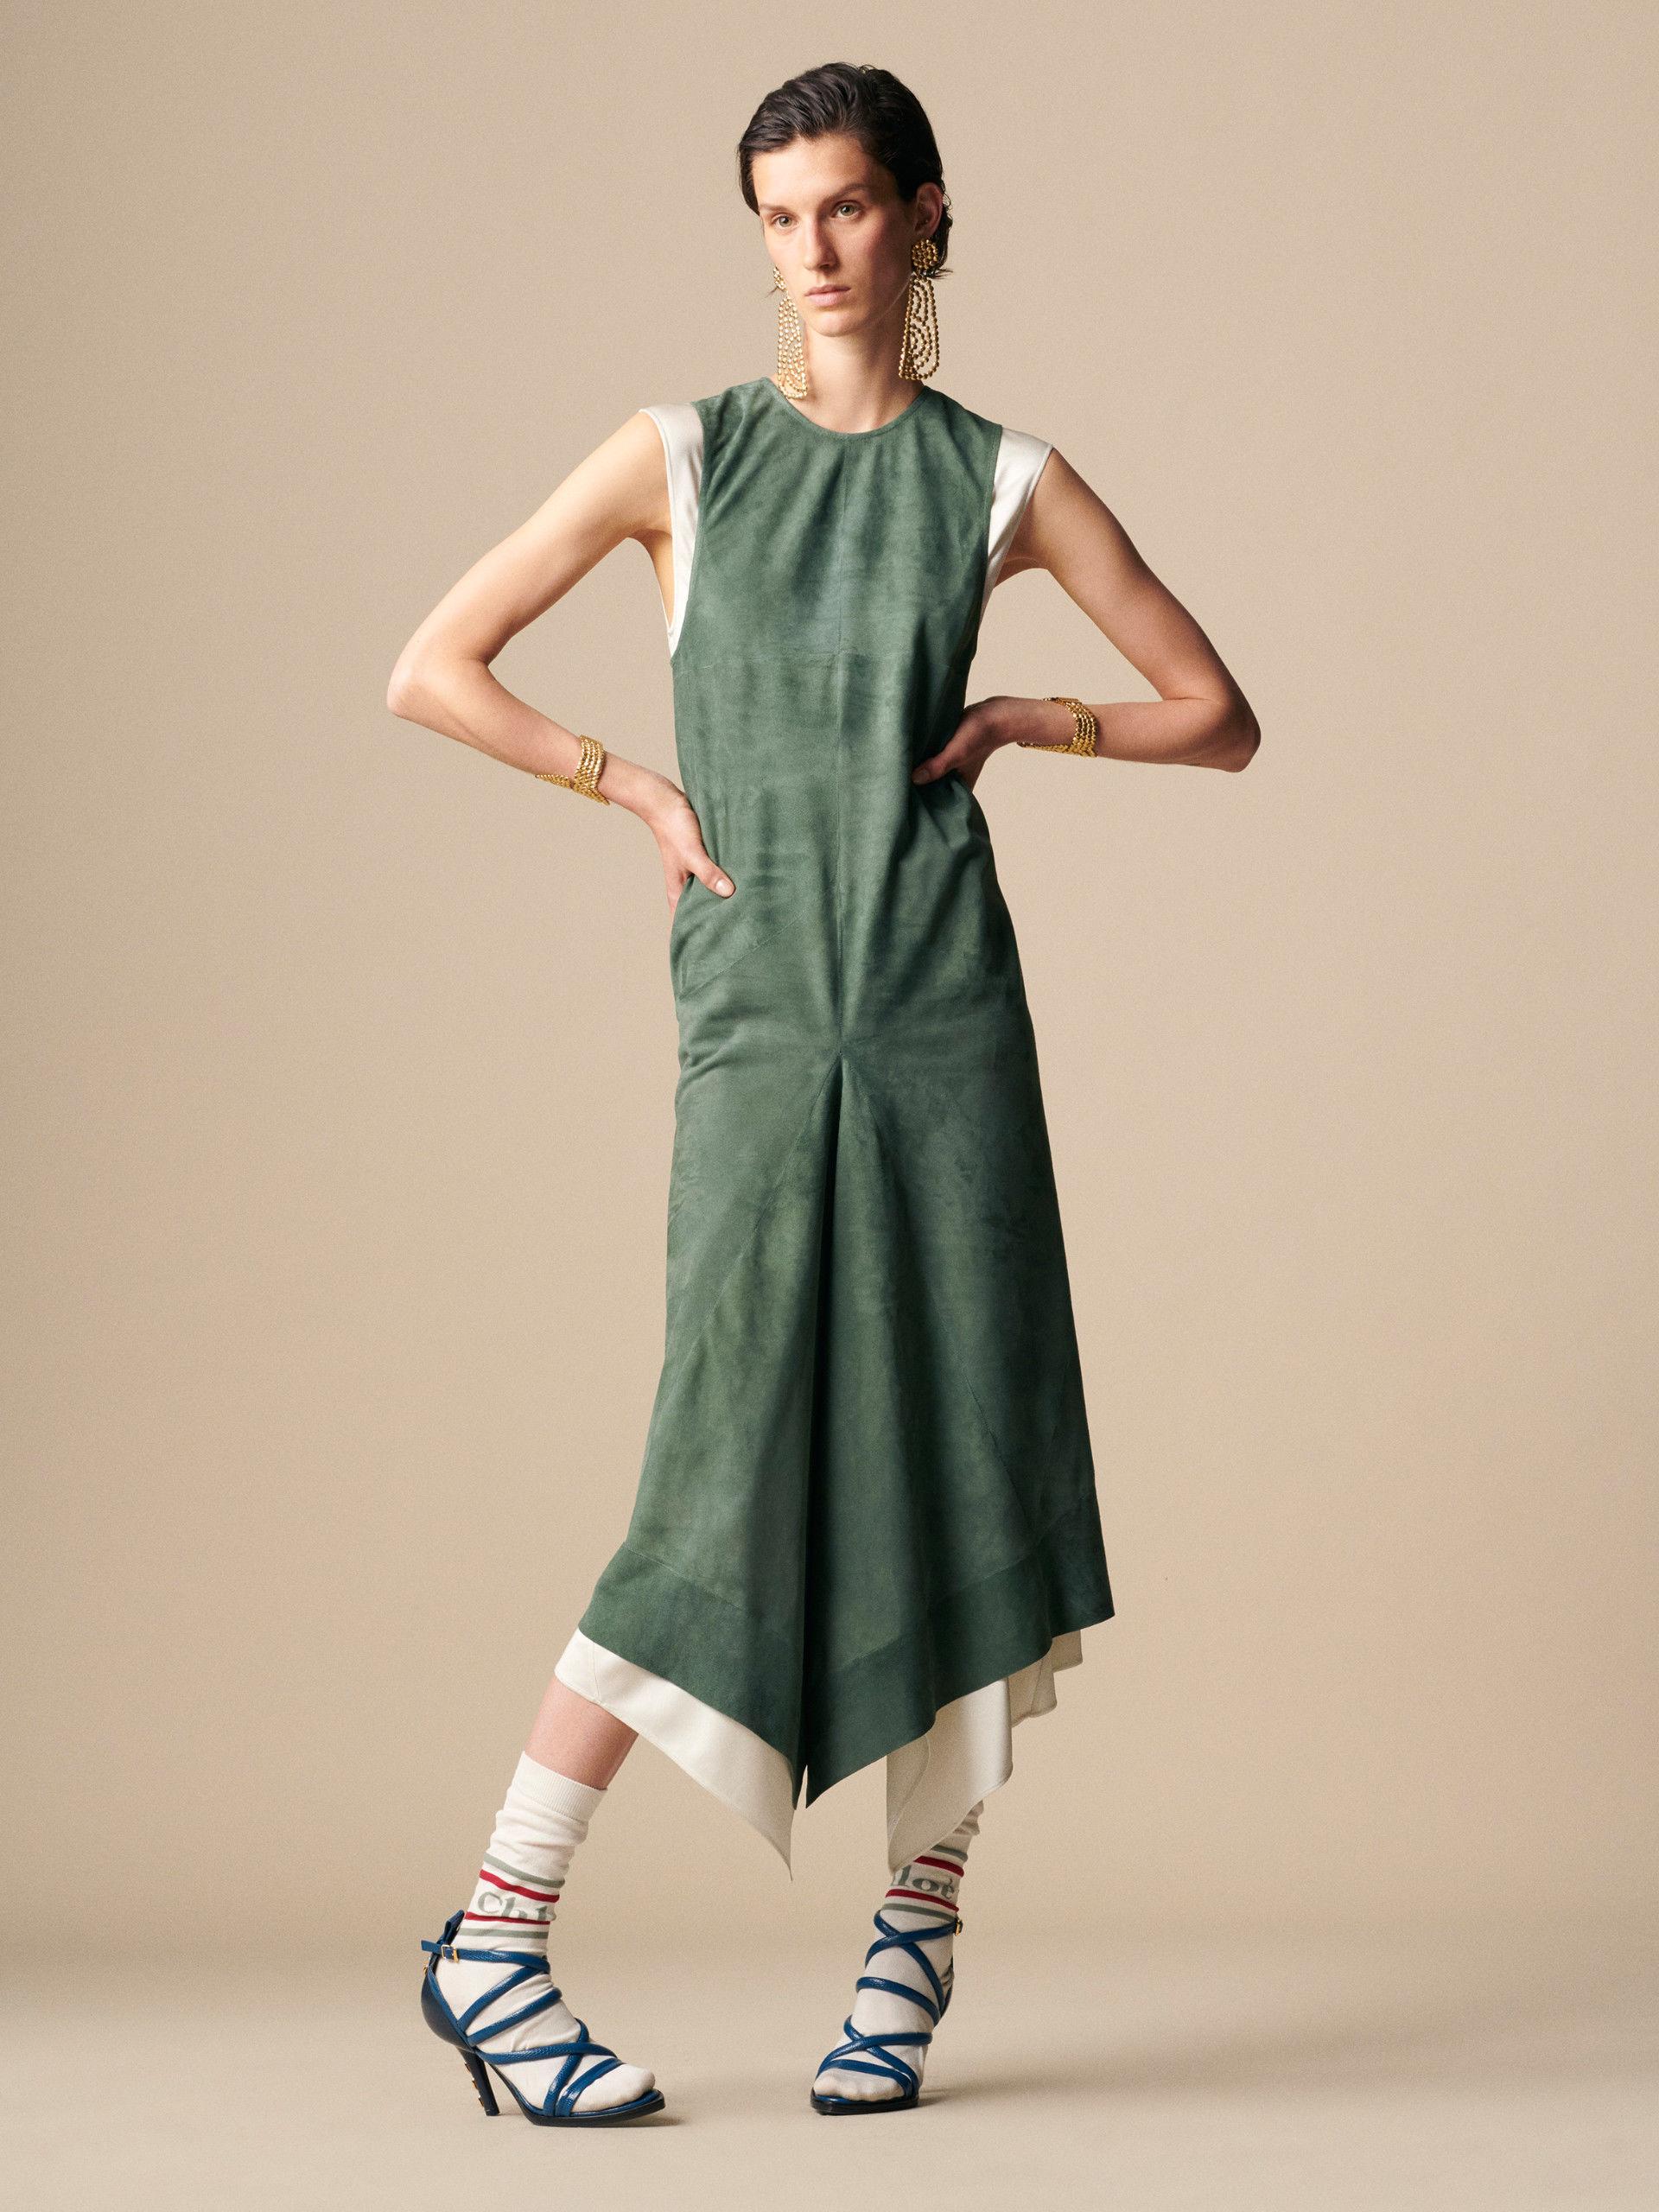 be3b5335a5d5e Dress CHC19SCR062043L6 Stormy Green Velvet Goatskin